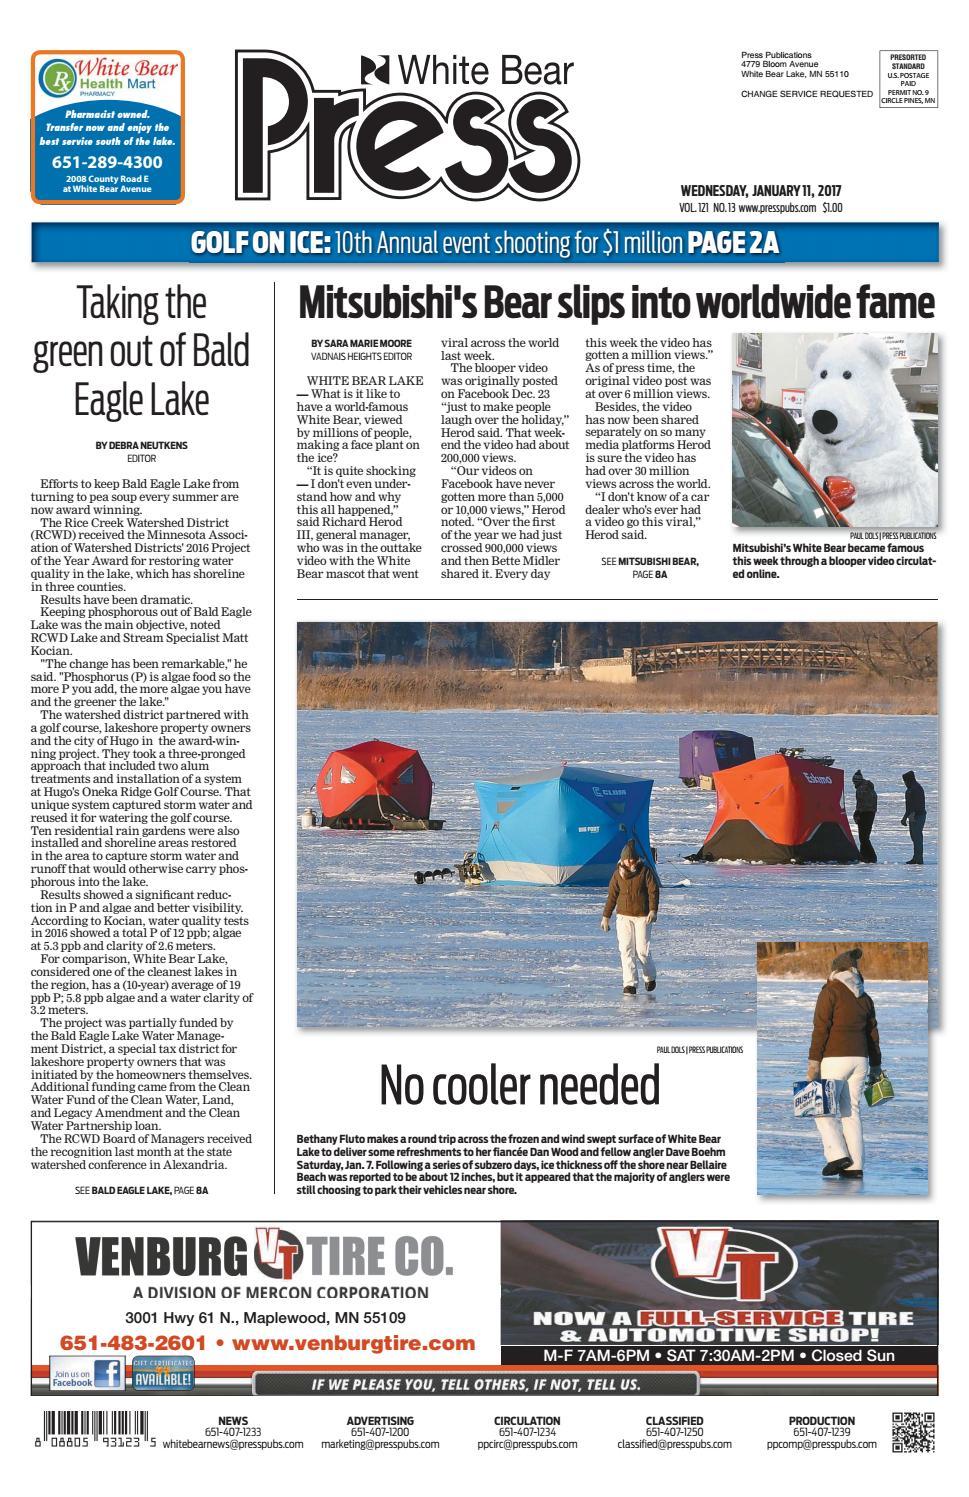 White Bear Press by Press Publications - issuu